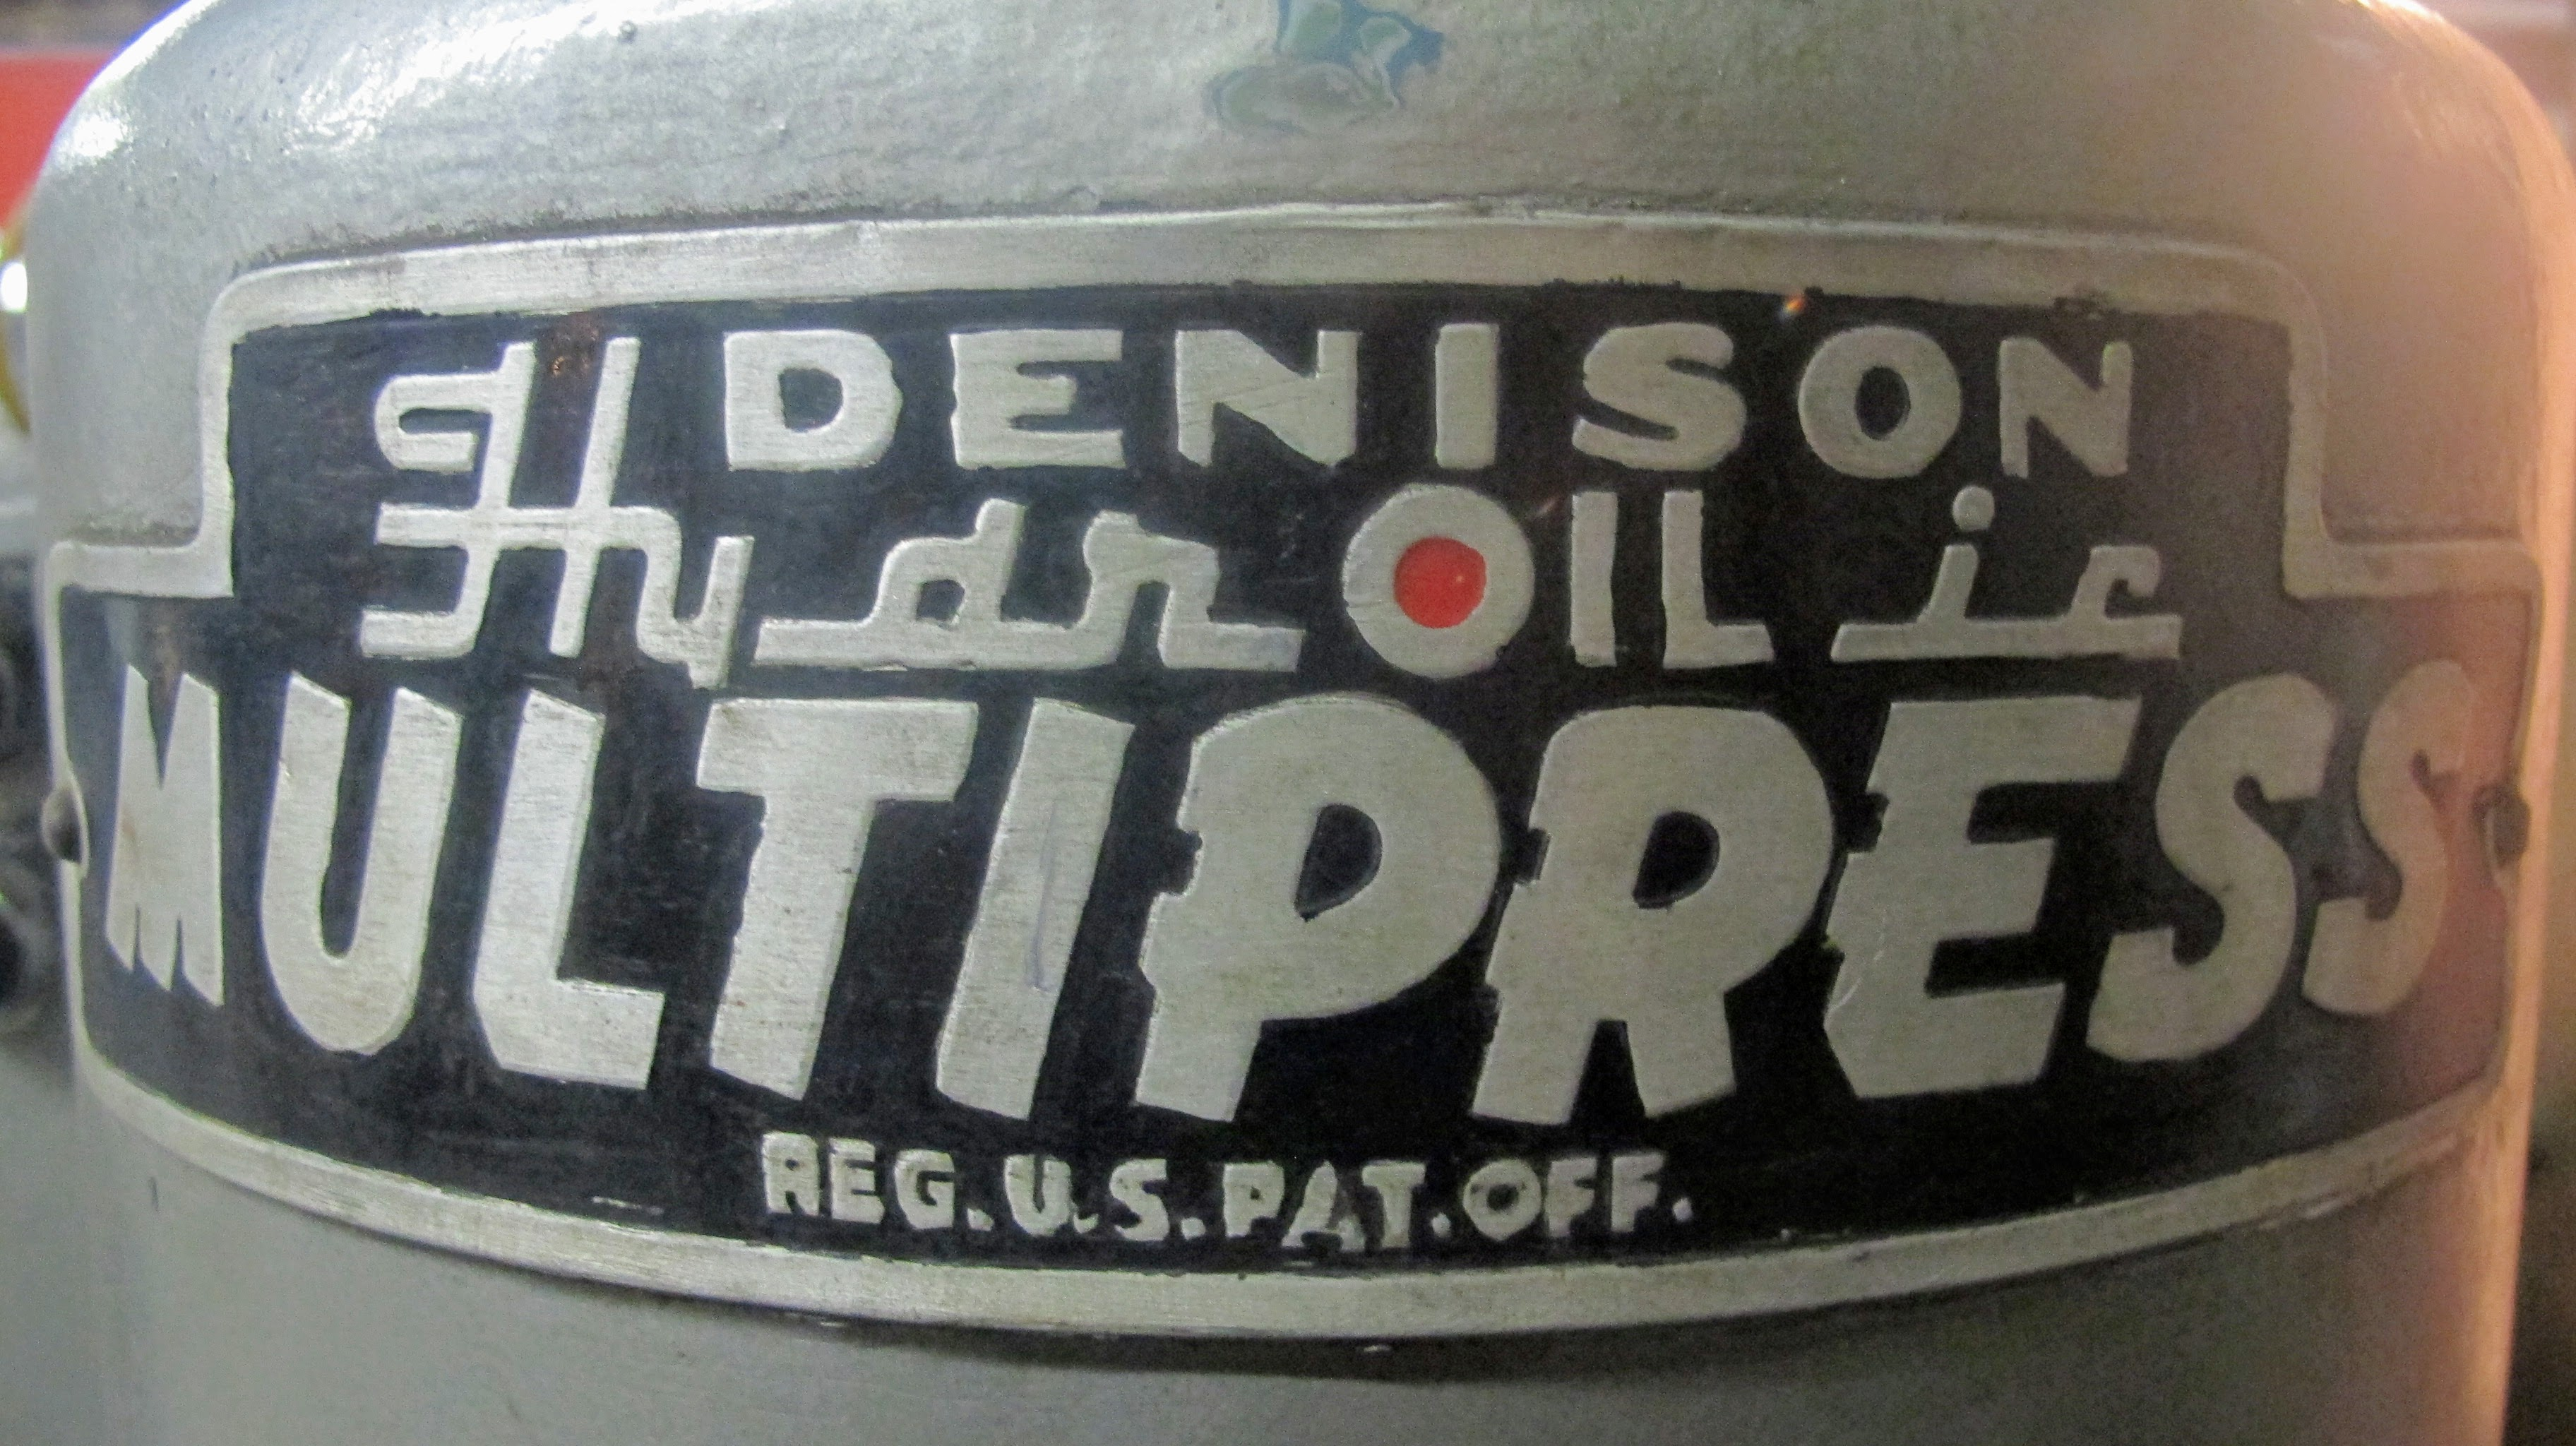 DENISON HYDROIL 5HP MULTIPRESS - Image 6 of 6